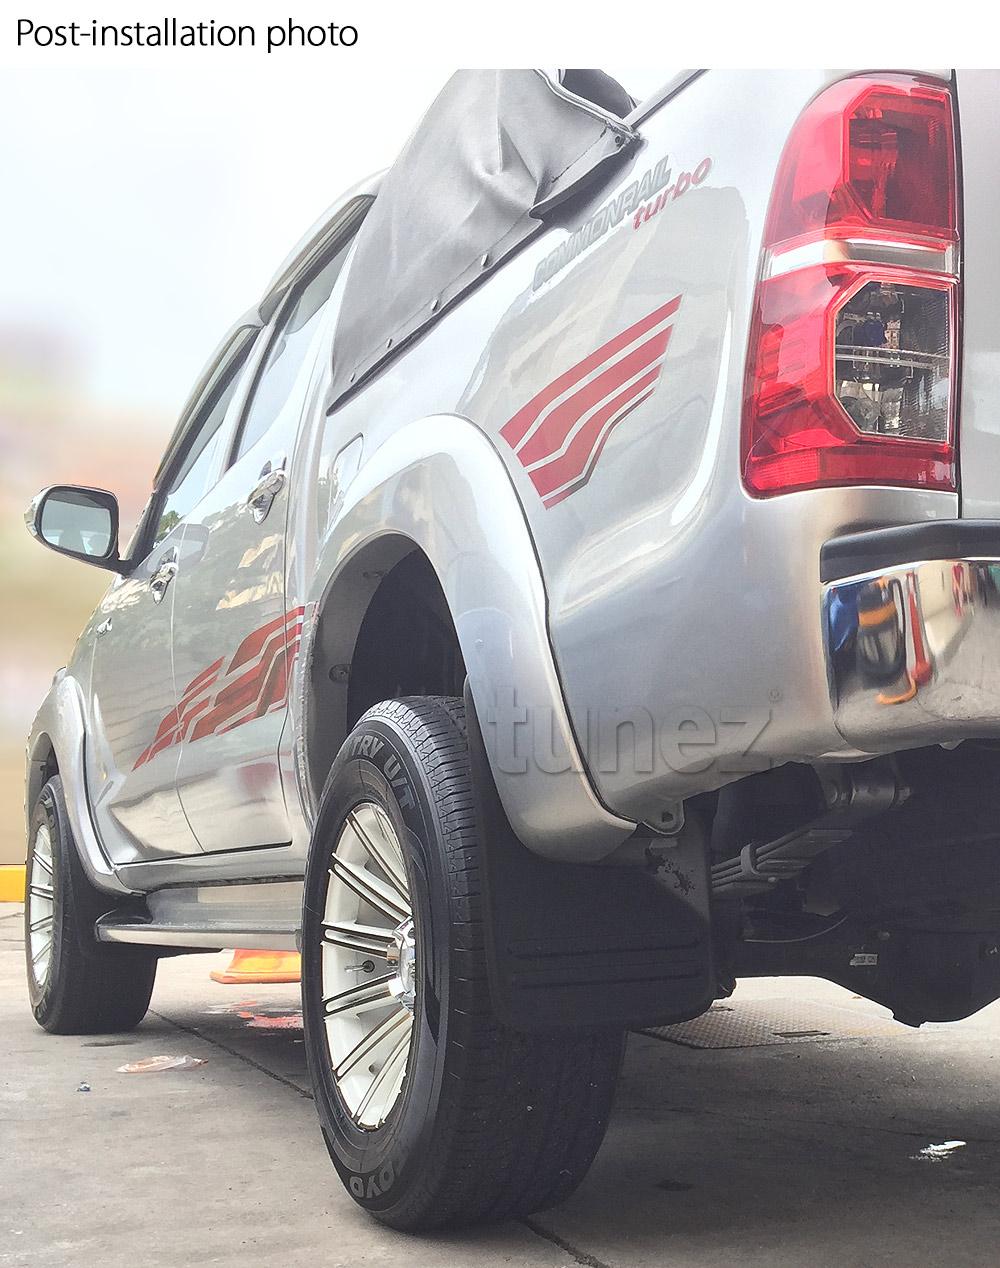 /2014/auto camion 4/pezzo OEM Fitment paraspruzzi paraspruzzi parafango per Hilux 2005/